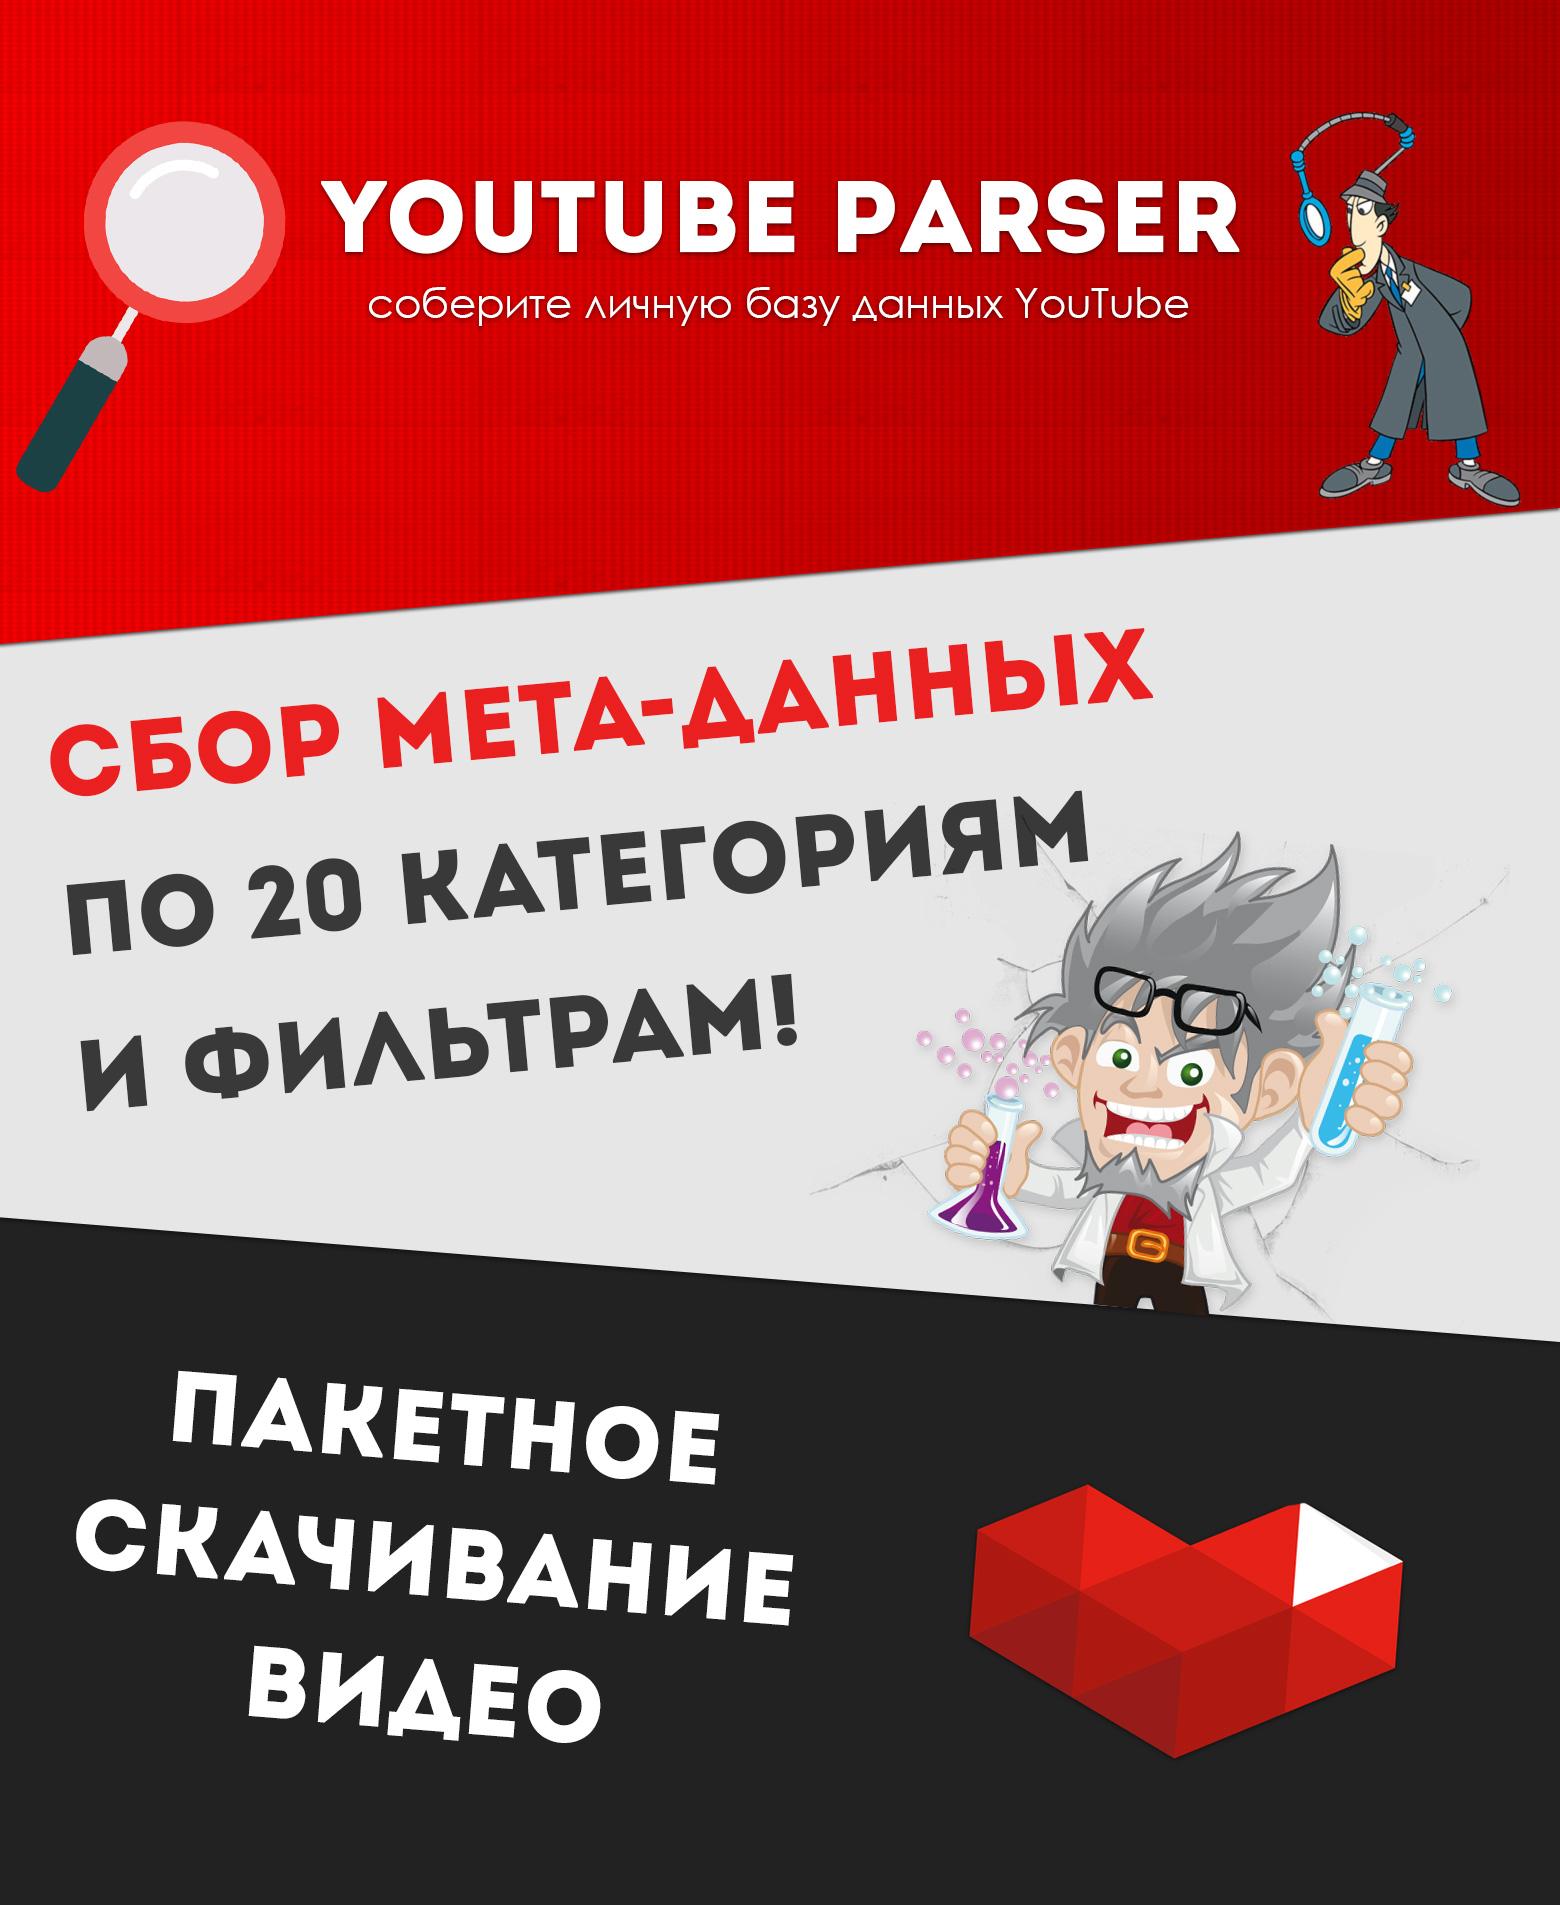 youtubeparser-Recovered_01.jpg